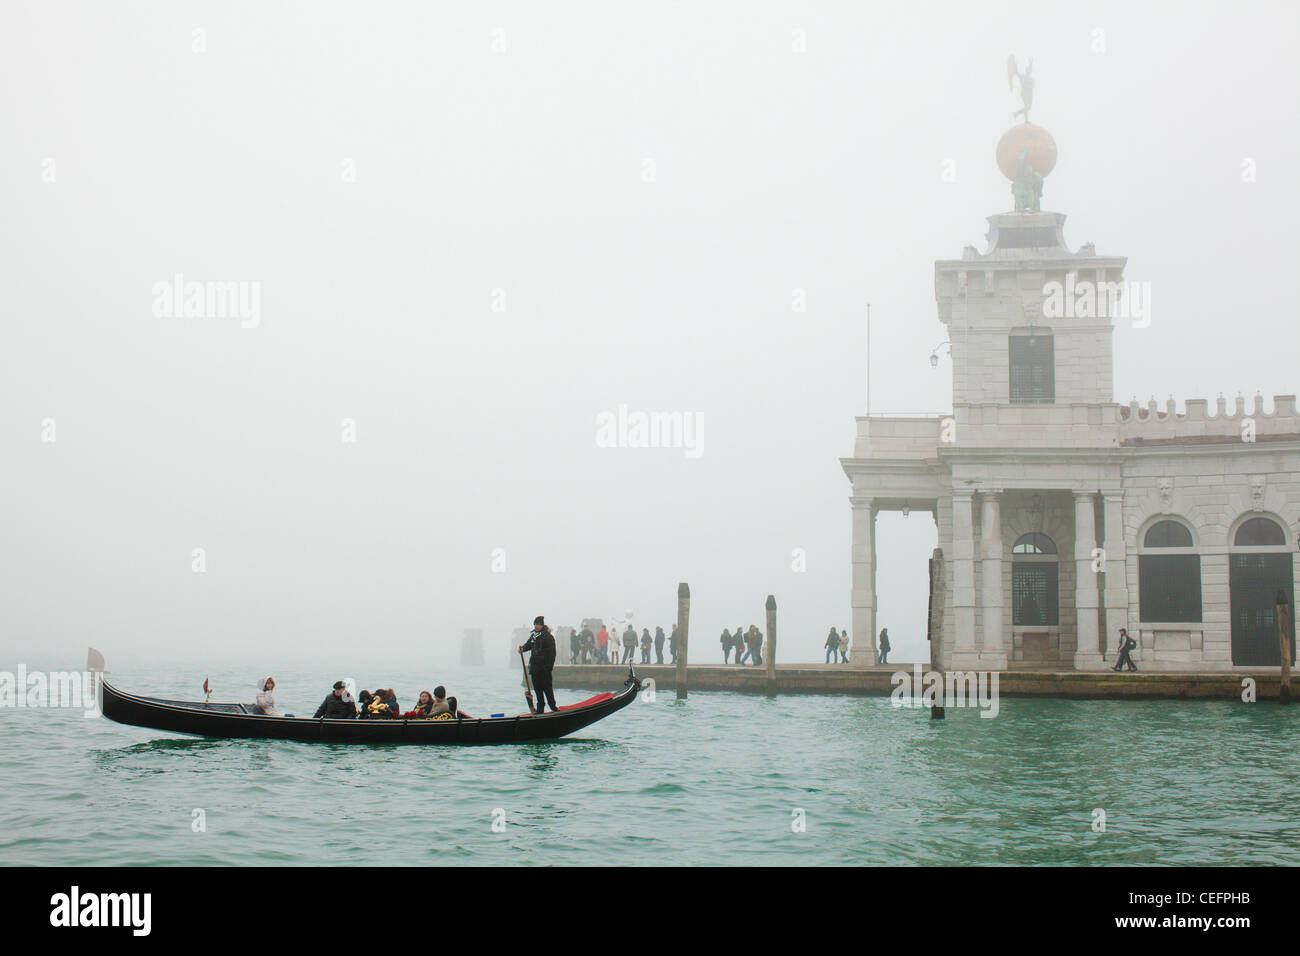 A gondola crosses the Bacino di San Marco in heavy fog in front of the Punta della Dogana. Venice, Italy. - Stock Image